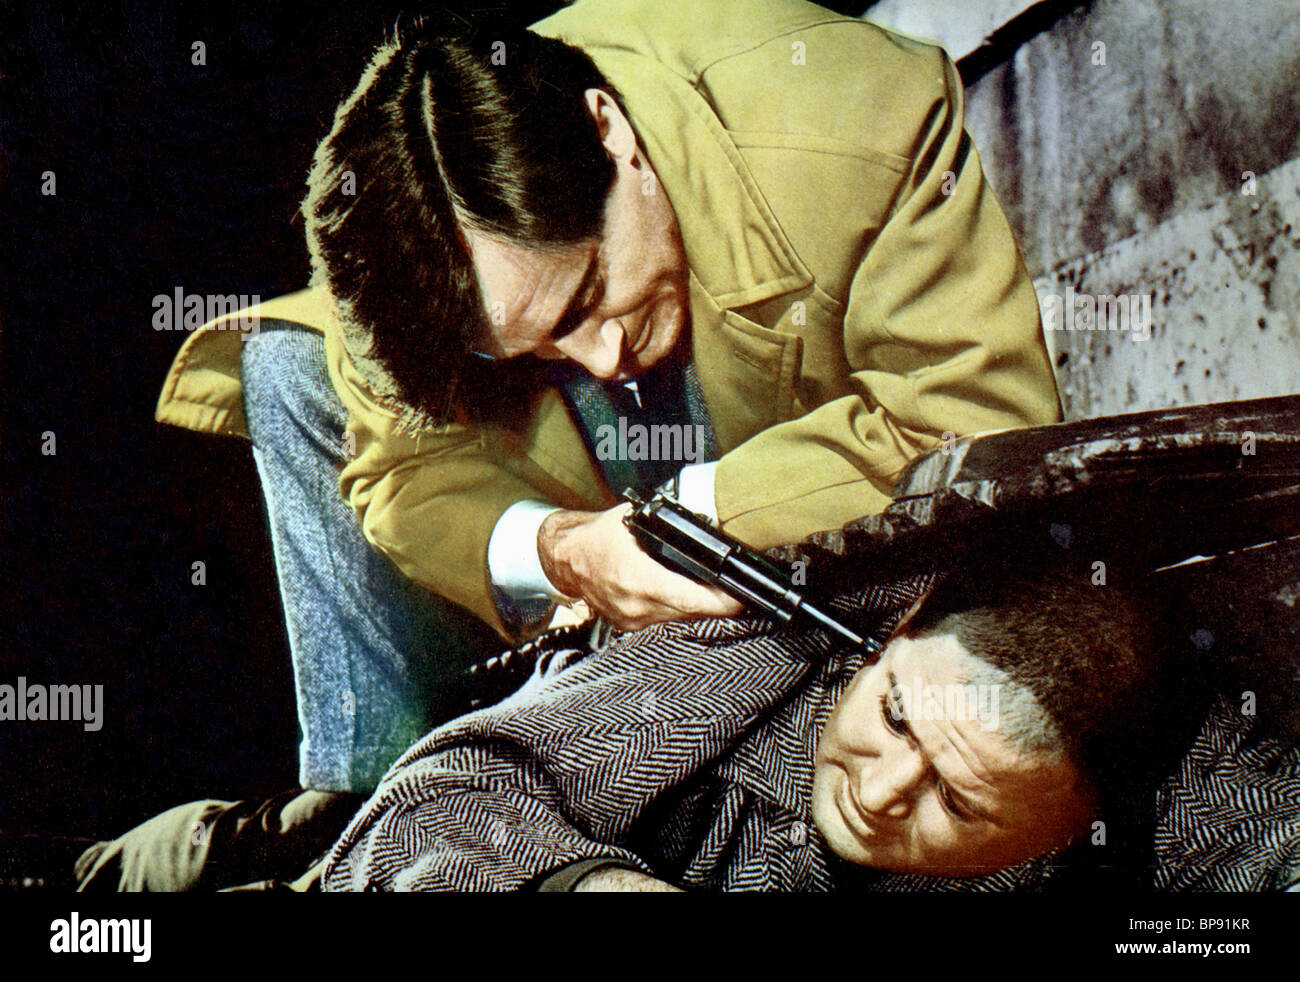 SCENE WITH ROBERT VAUGHN THE VENETIAN AFFAIR (1967) - Stock Image